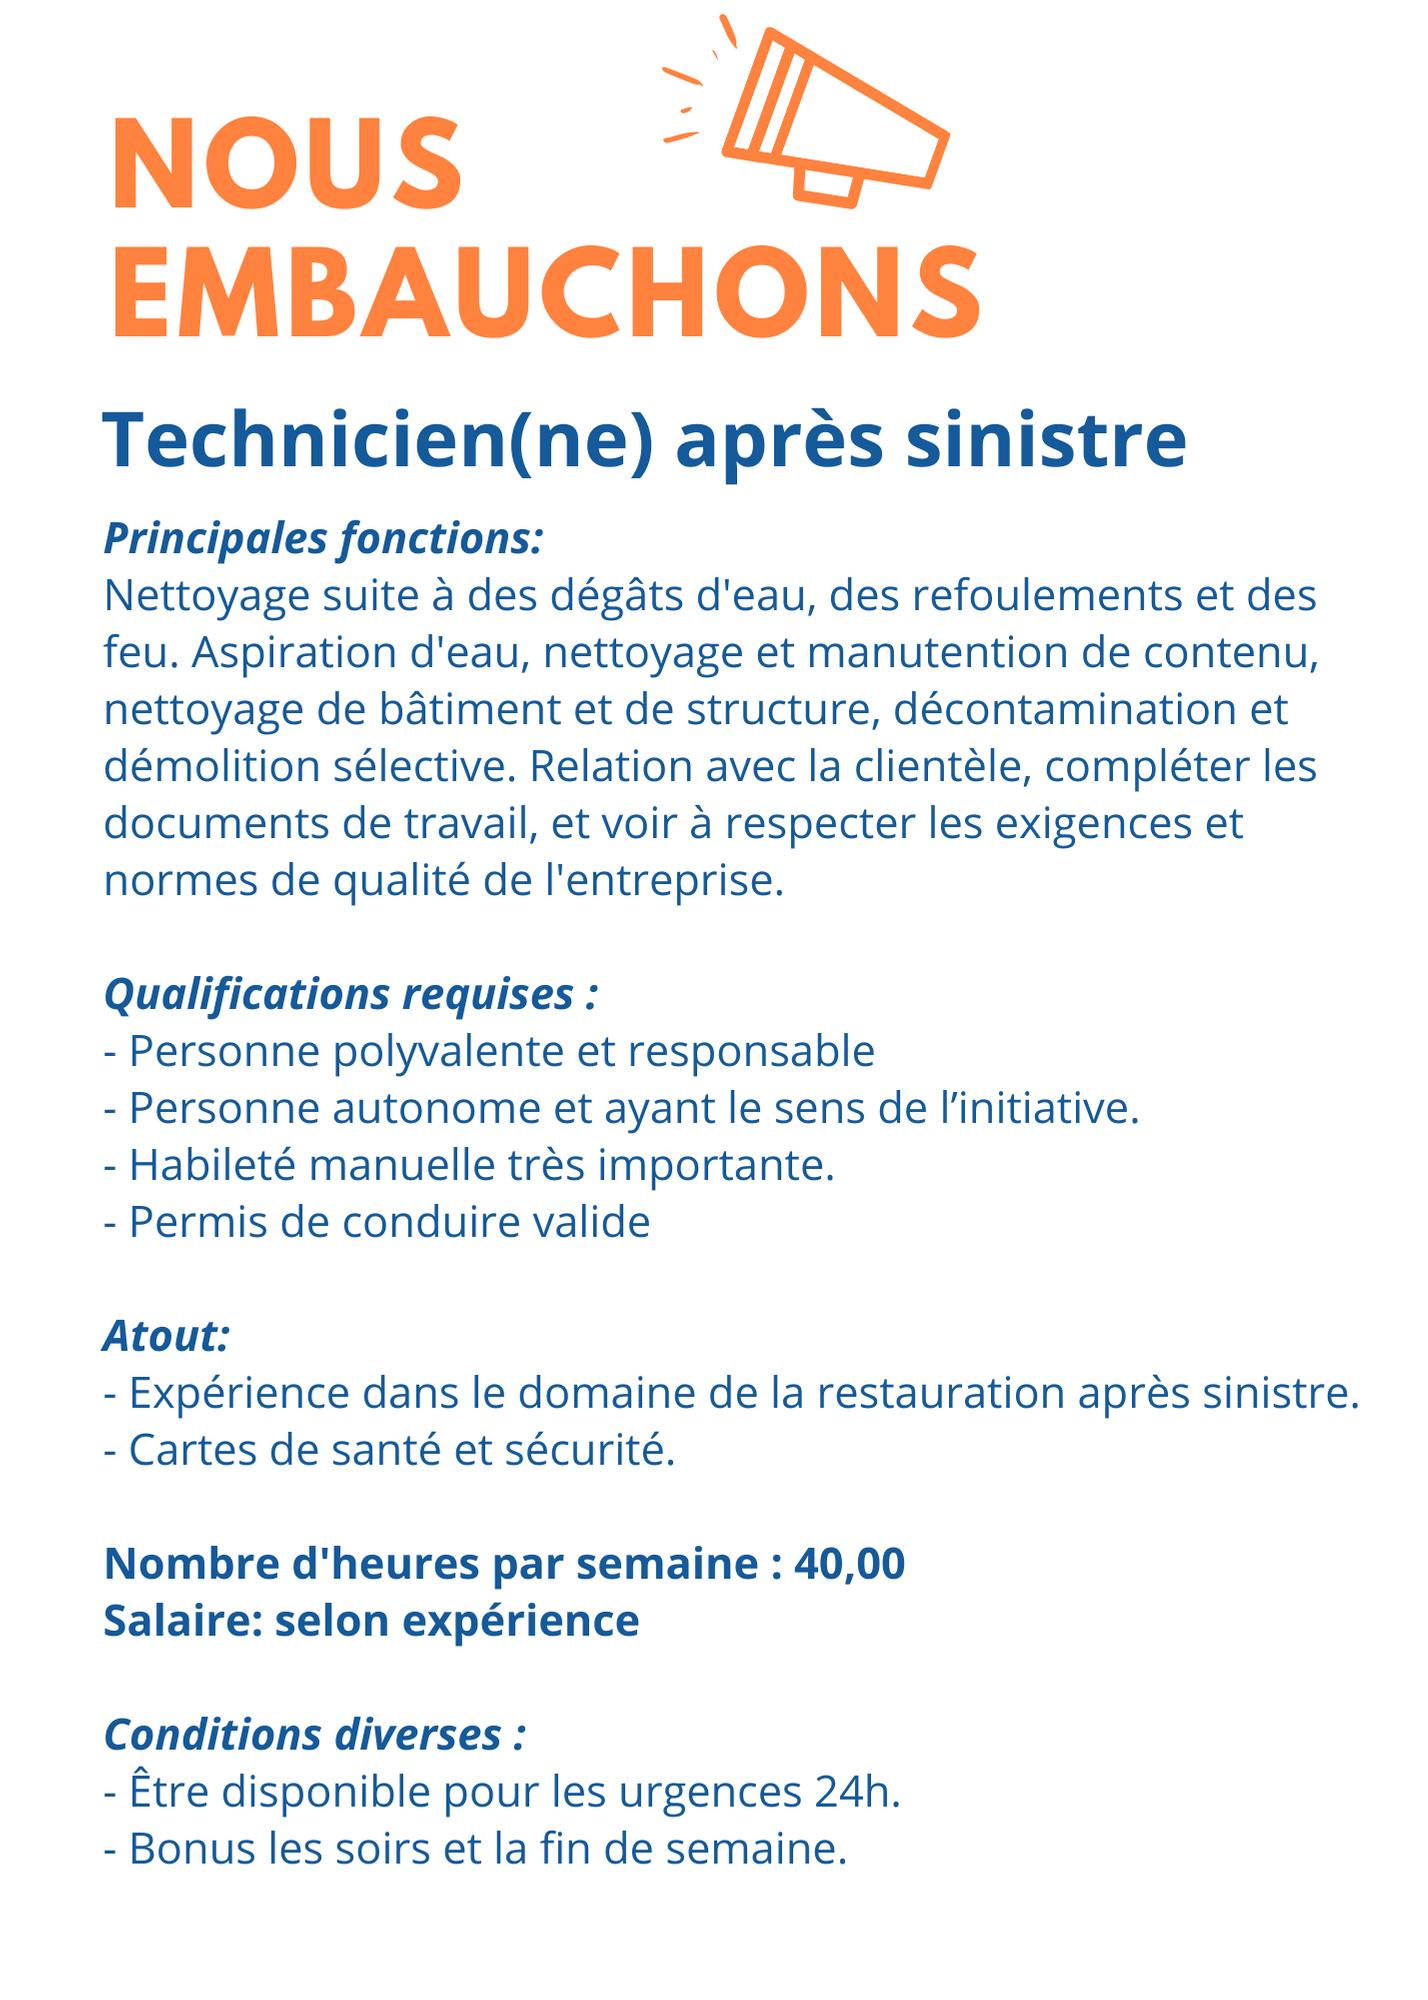 Orange Grayscale Photo Job Vacancy Announcement (4)